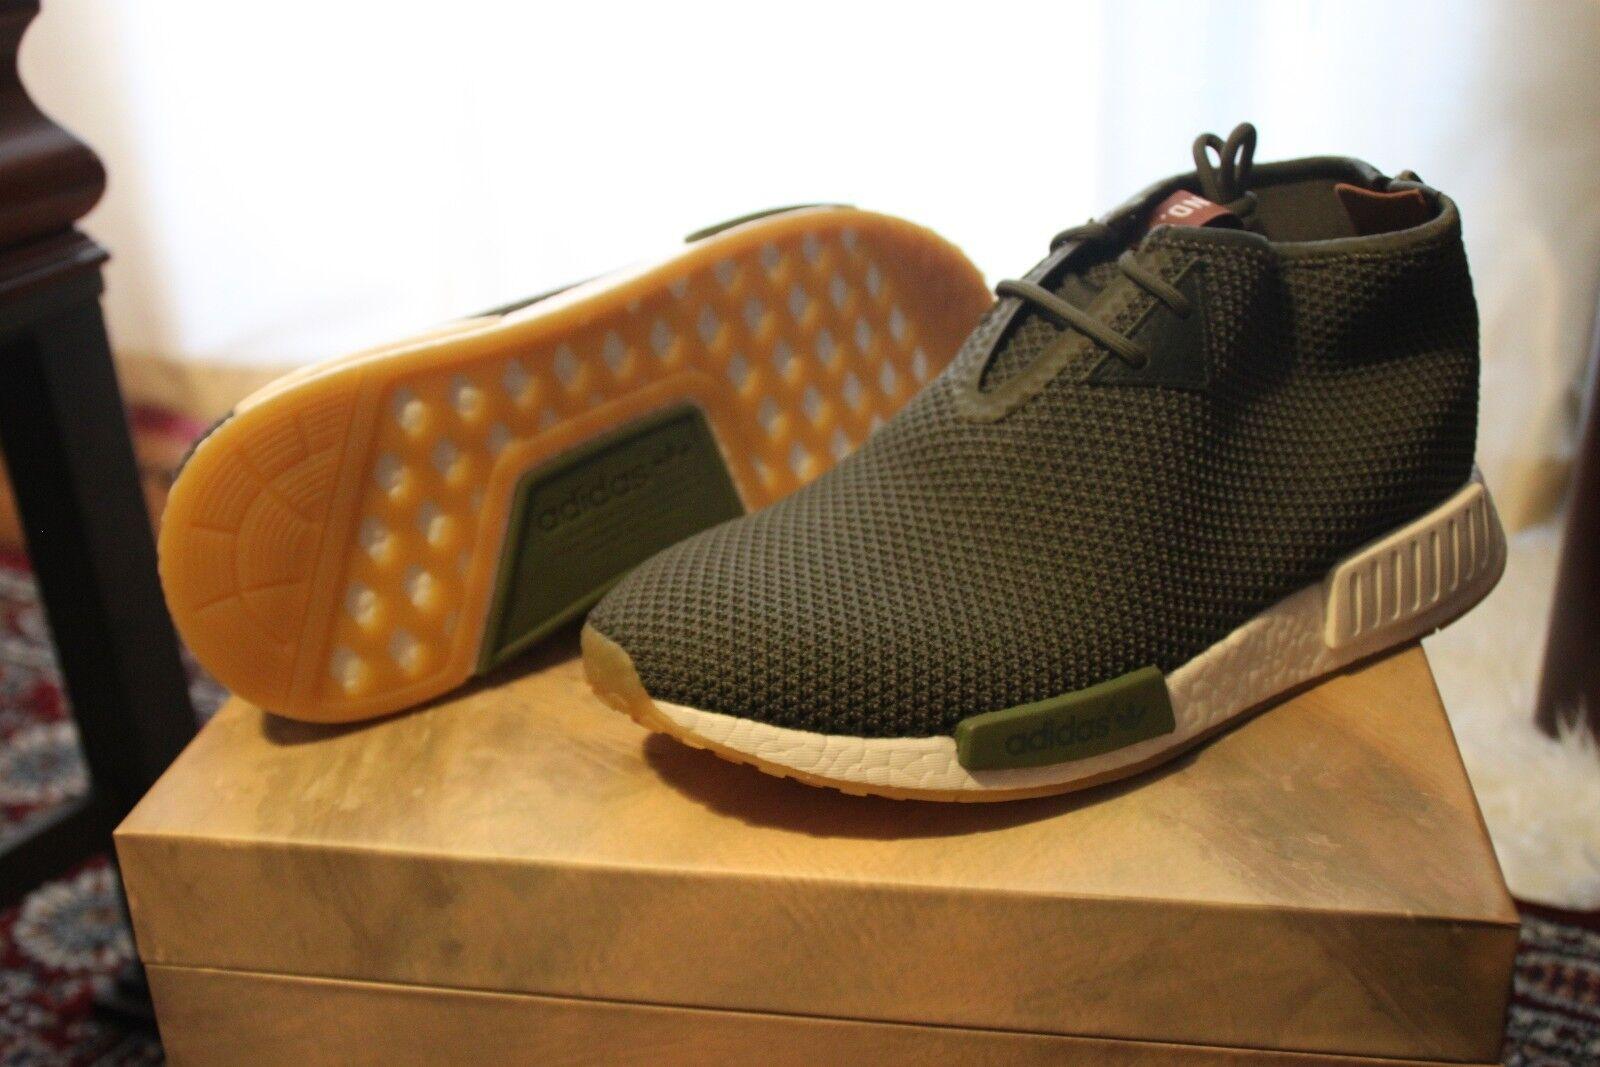 Raro Adidas Originals Consortium X Ropa NMD C1 Chukka Sahara END